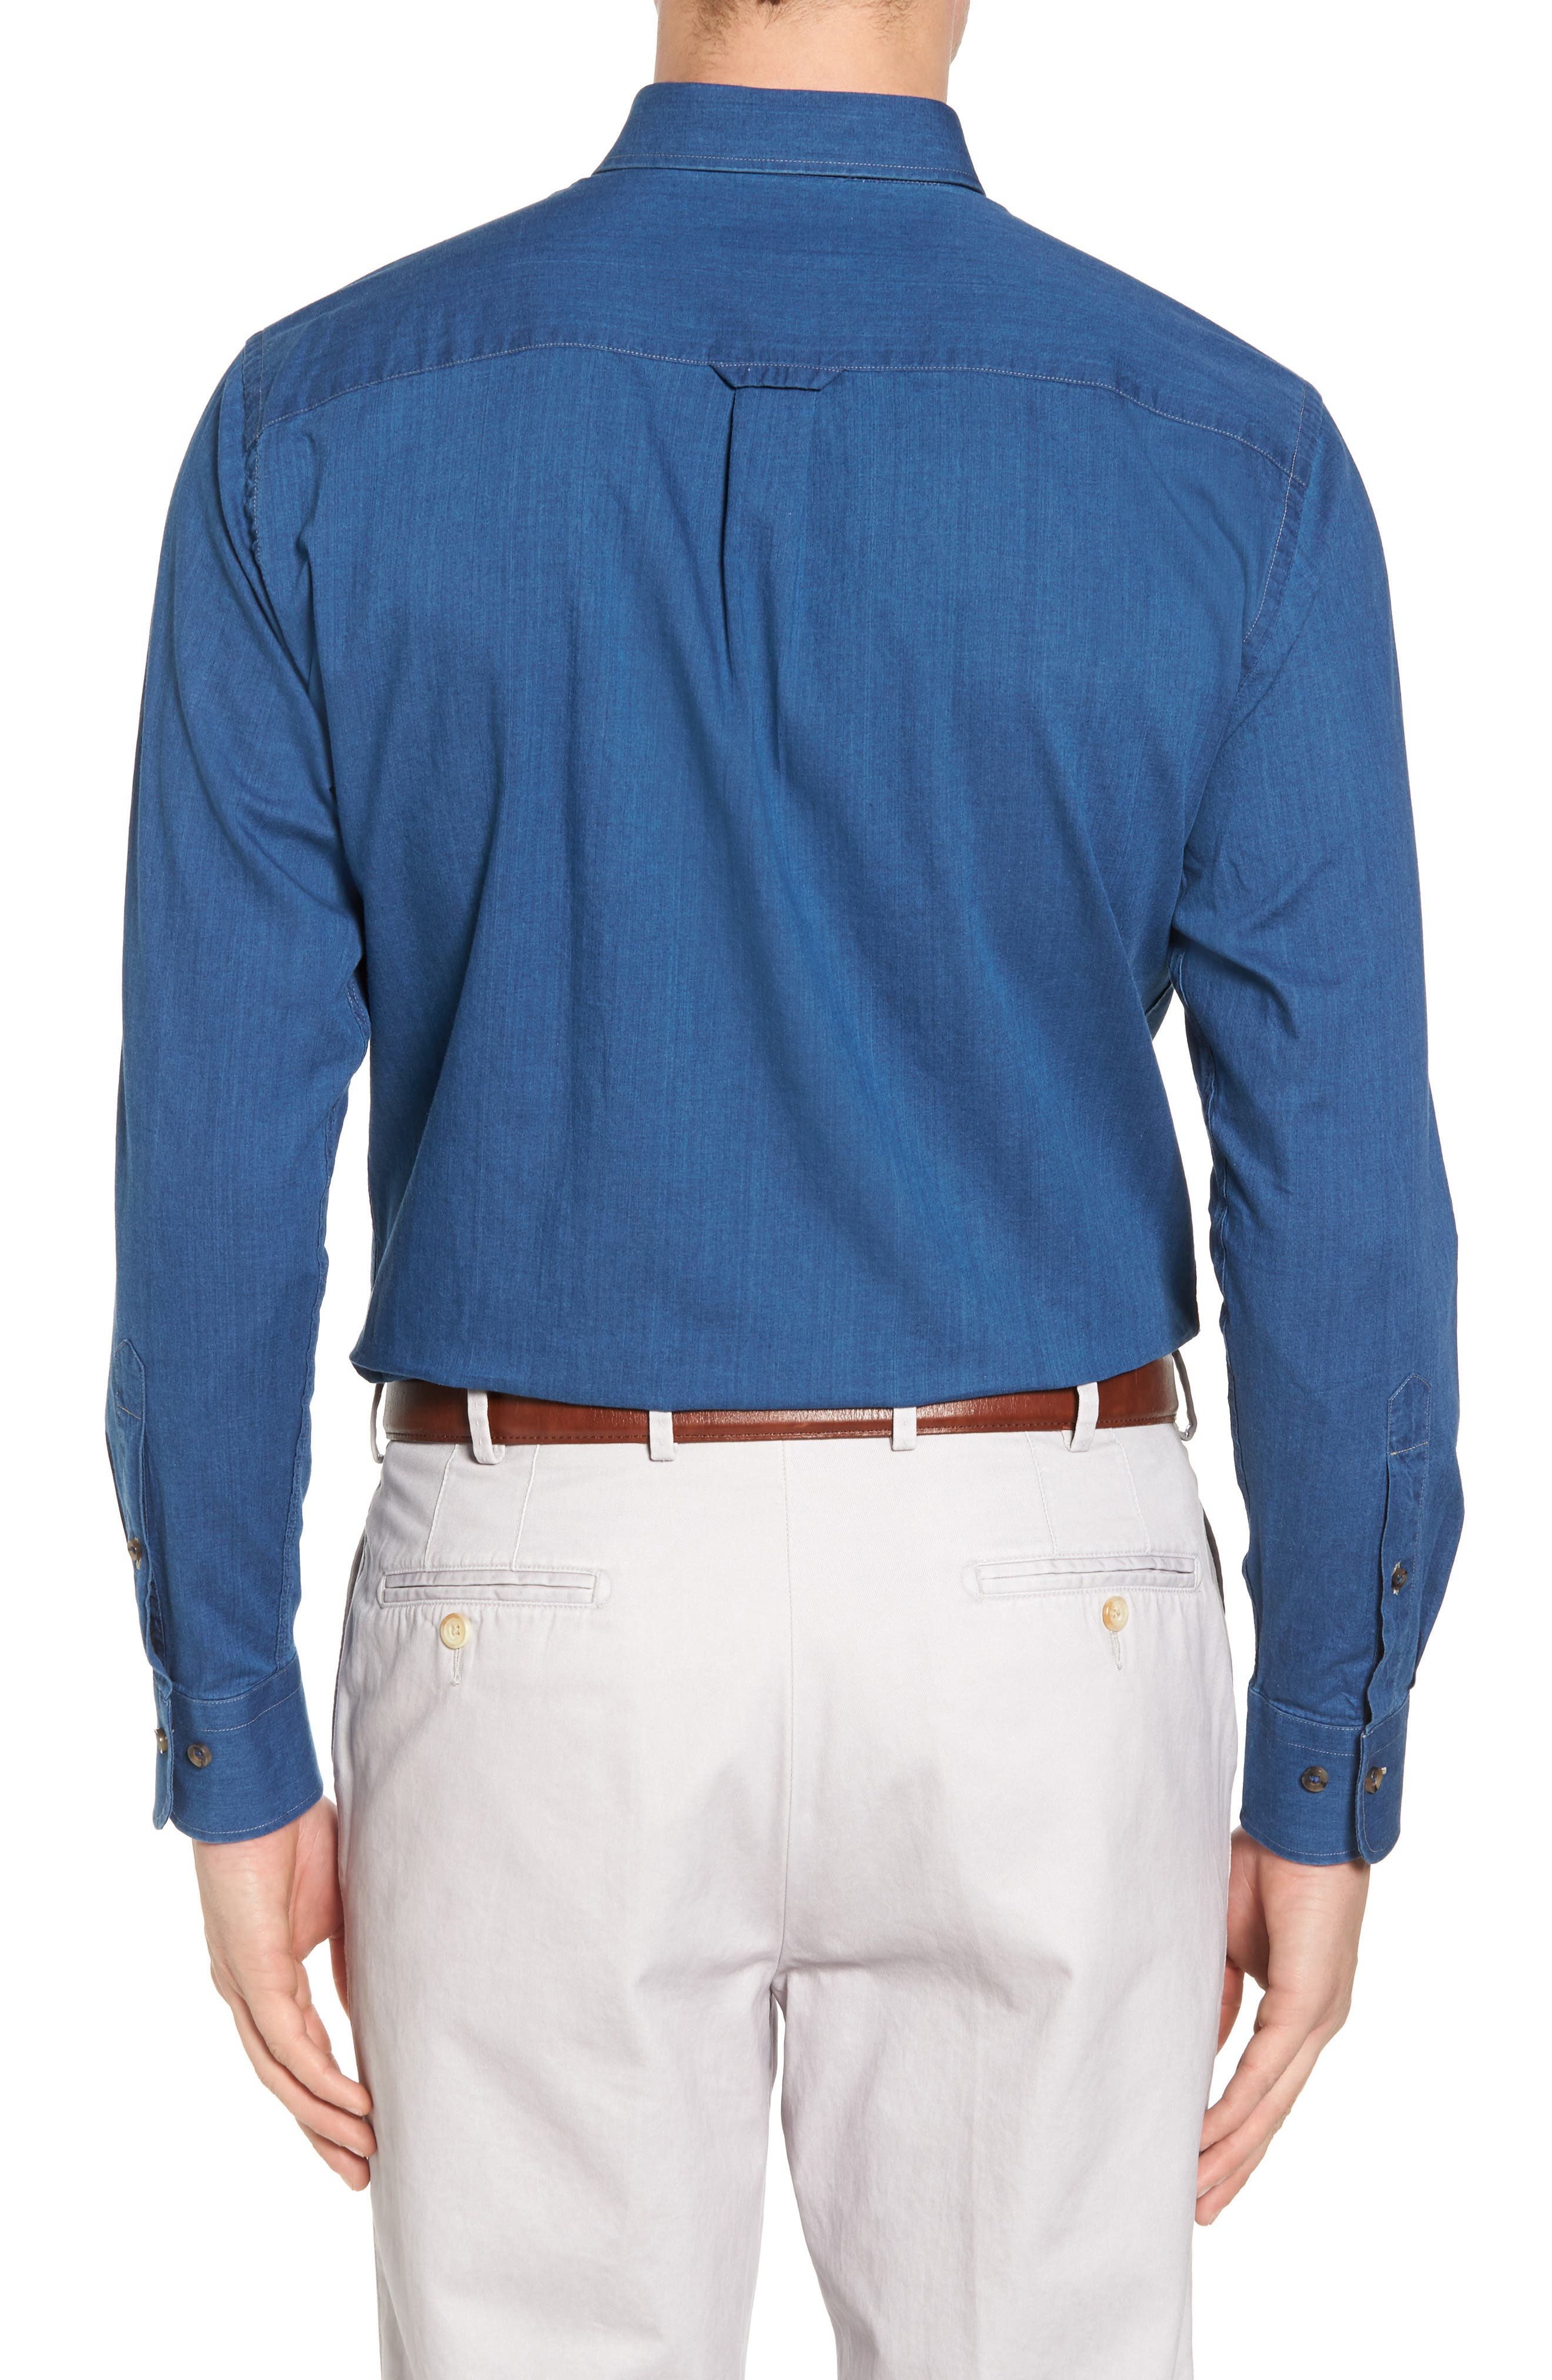 Crown Vintage Regular Fit Denim Sport Shirt,                             Alternate thumbnail 2, color,                             405